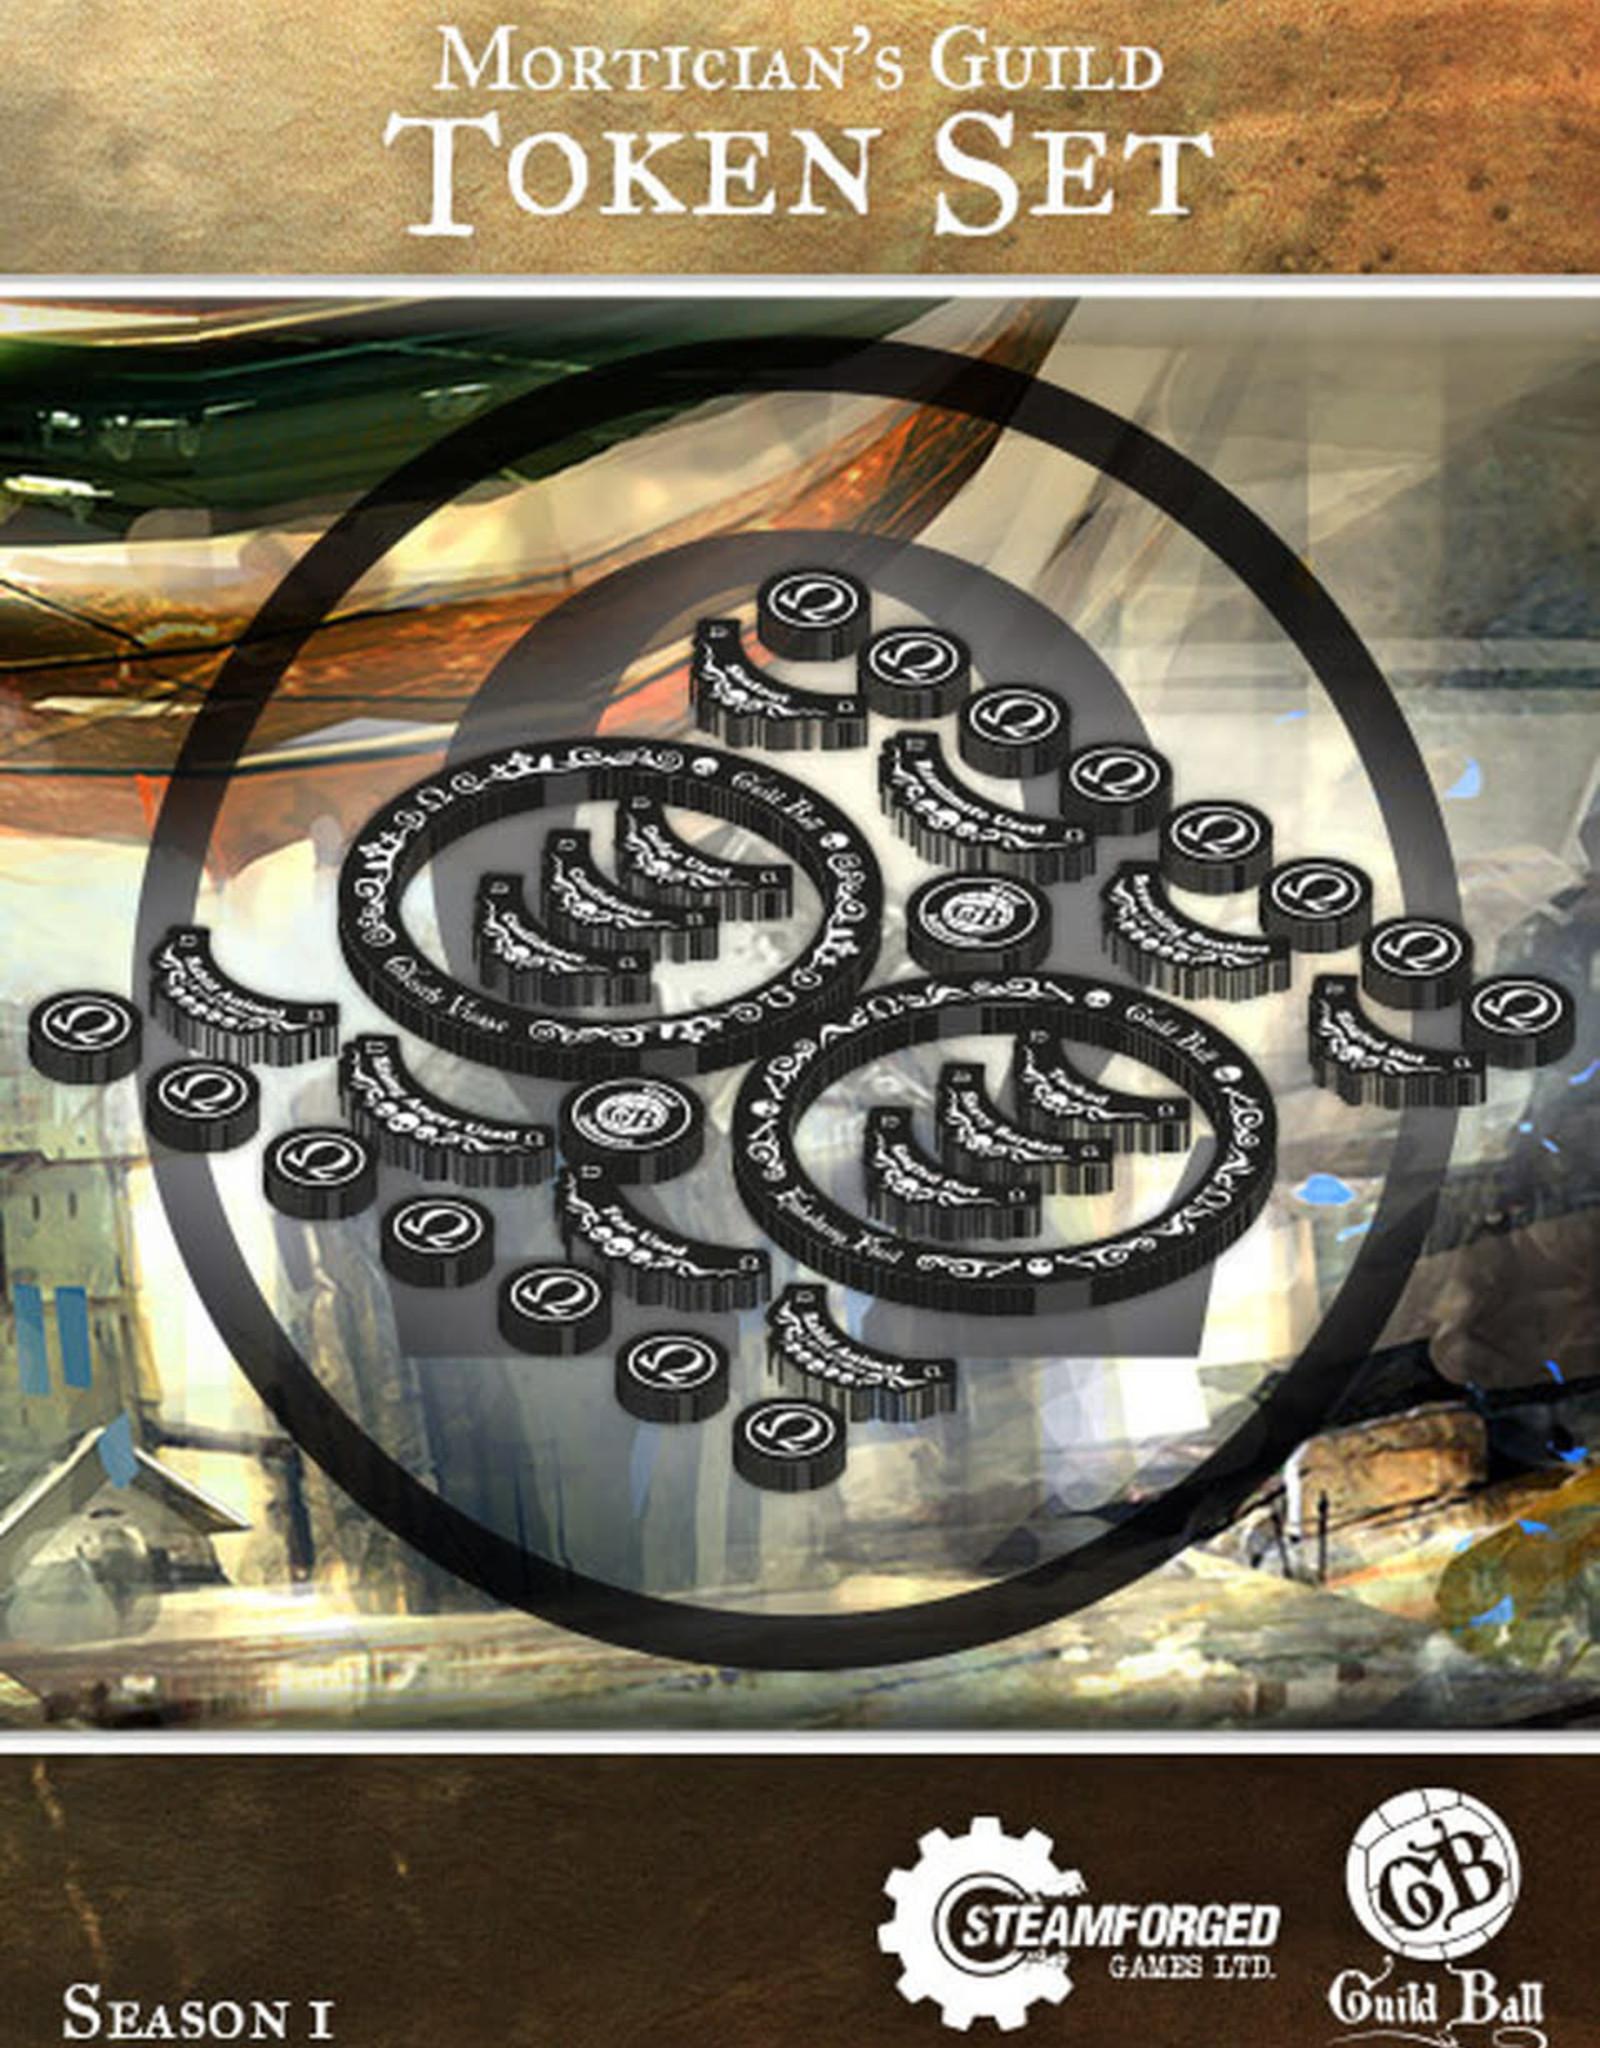 Guild Ball GB - Mortician's Guild Token Set